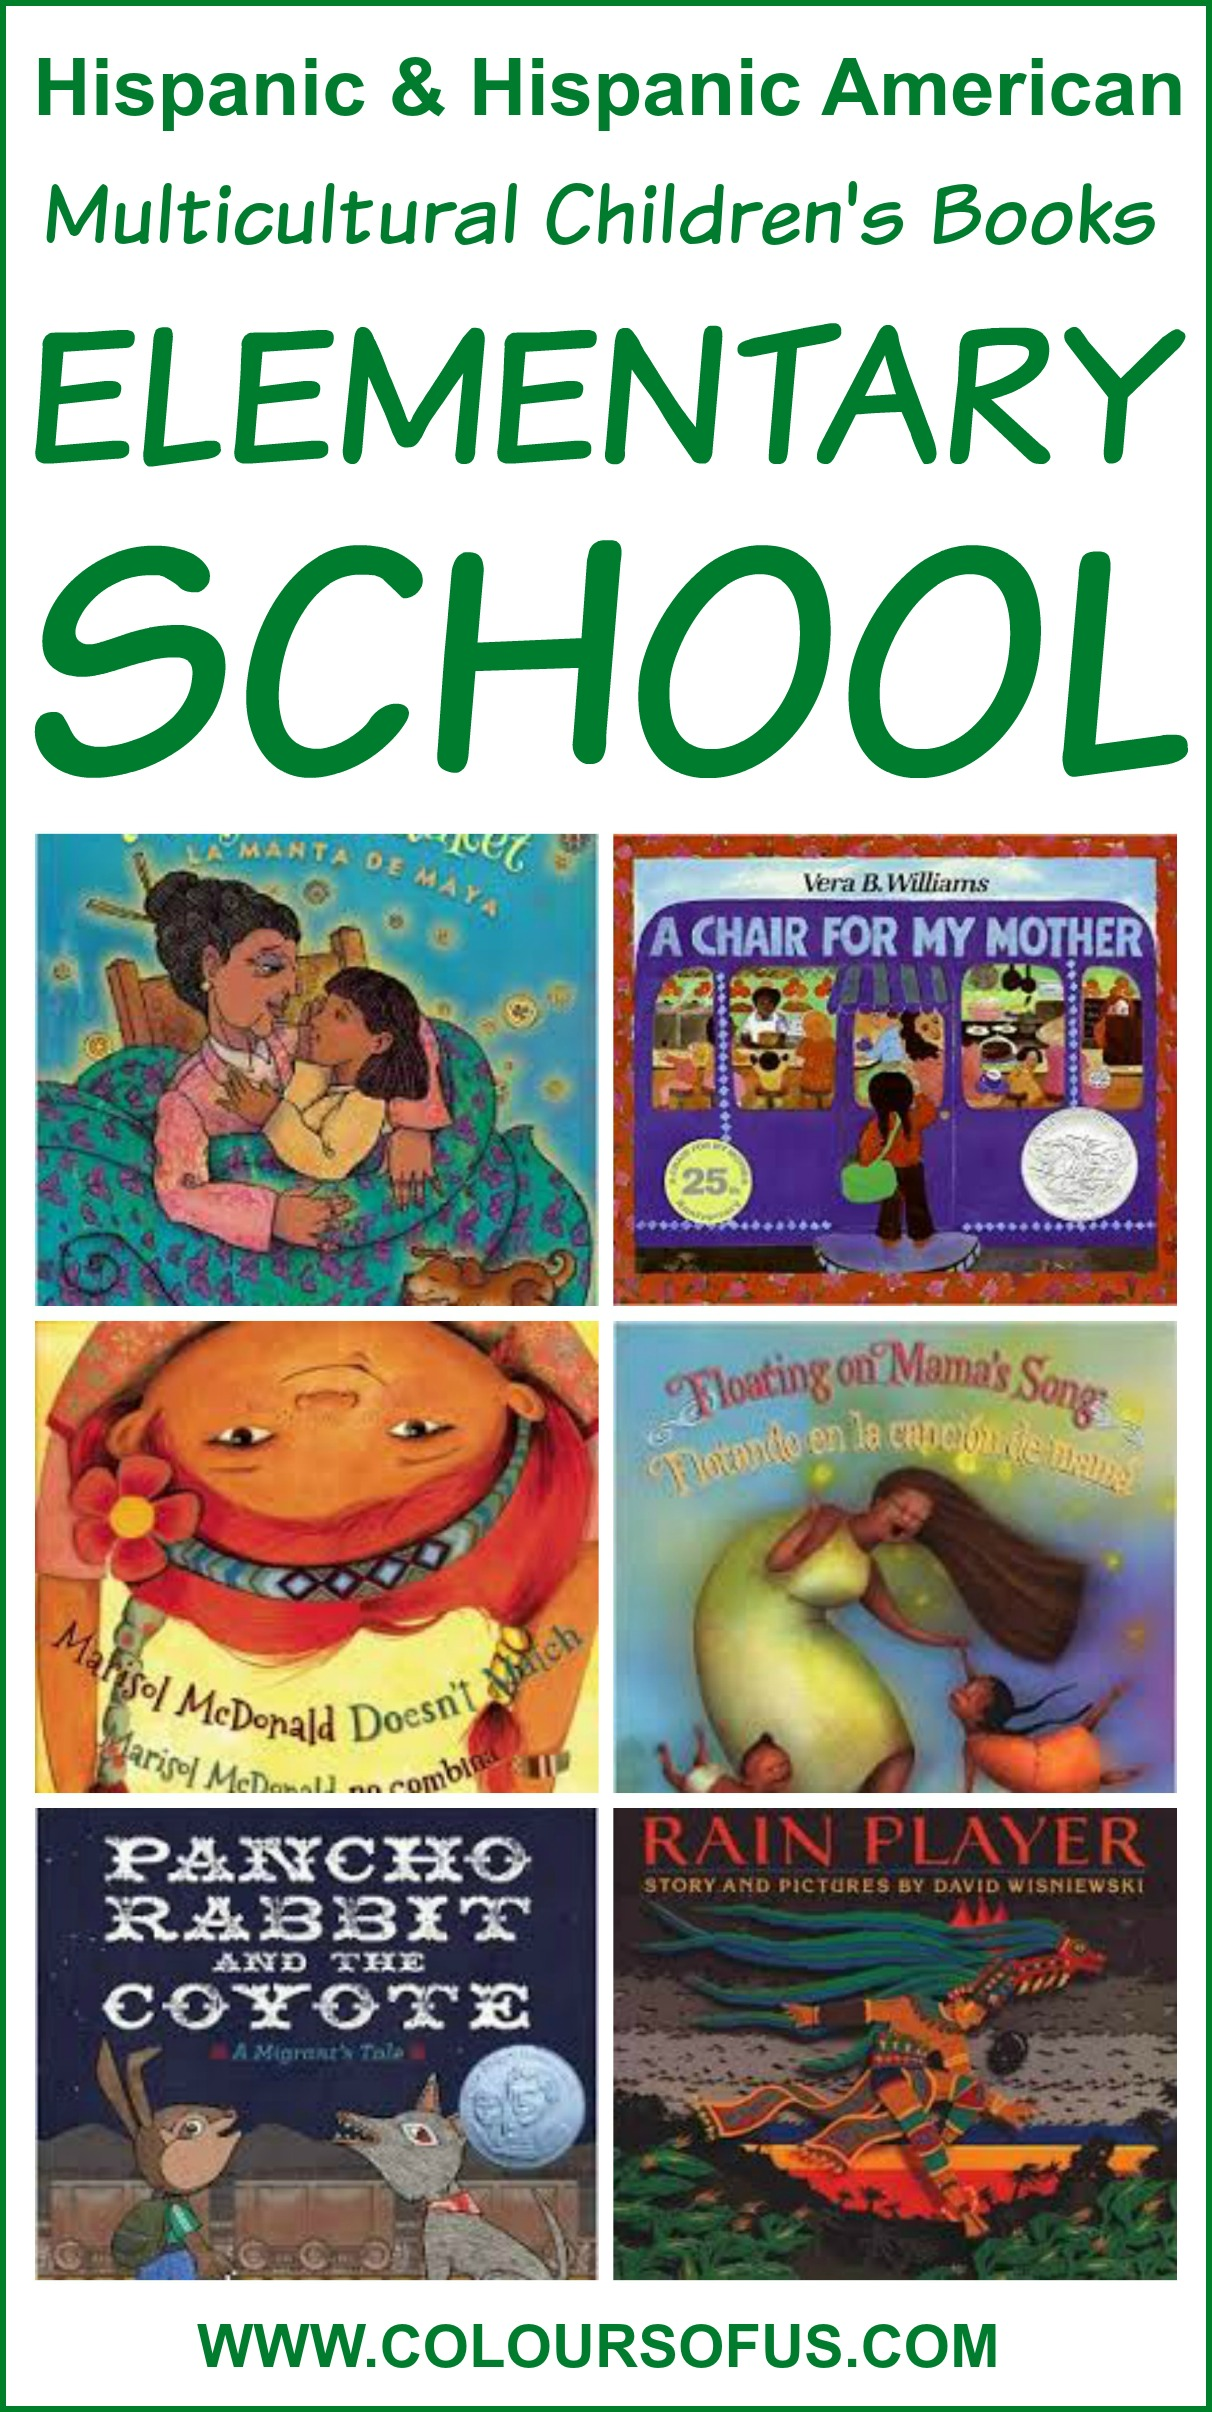 Hispanic Multicultural Children's Books – Elementary School